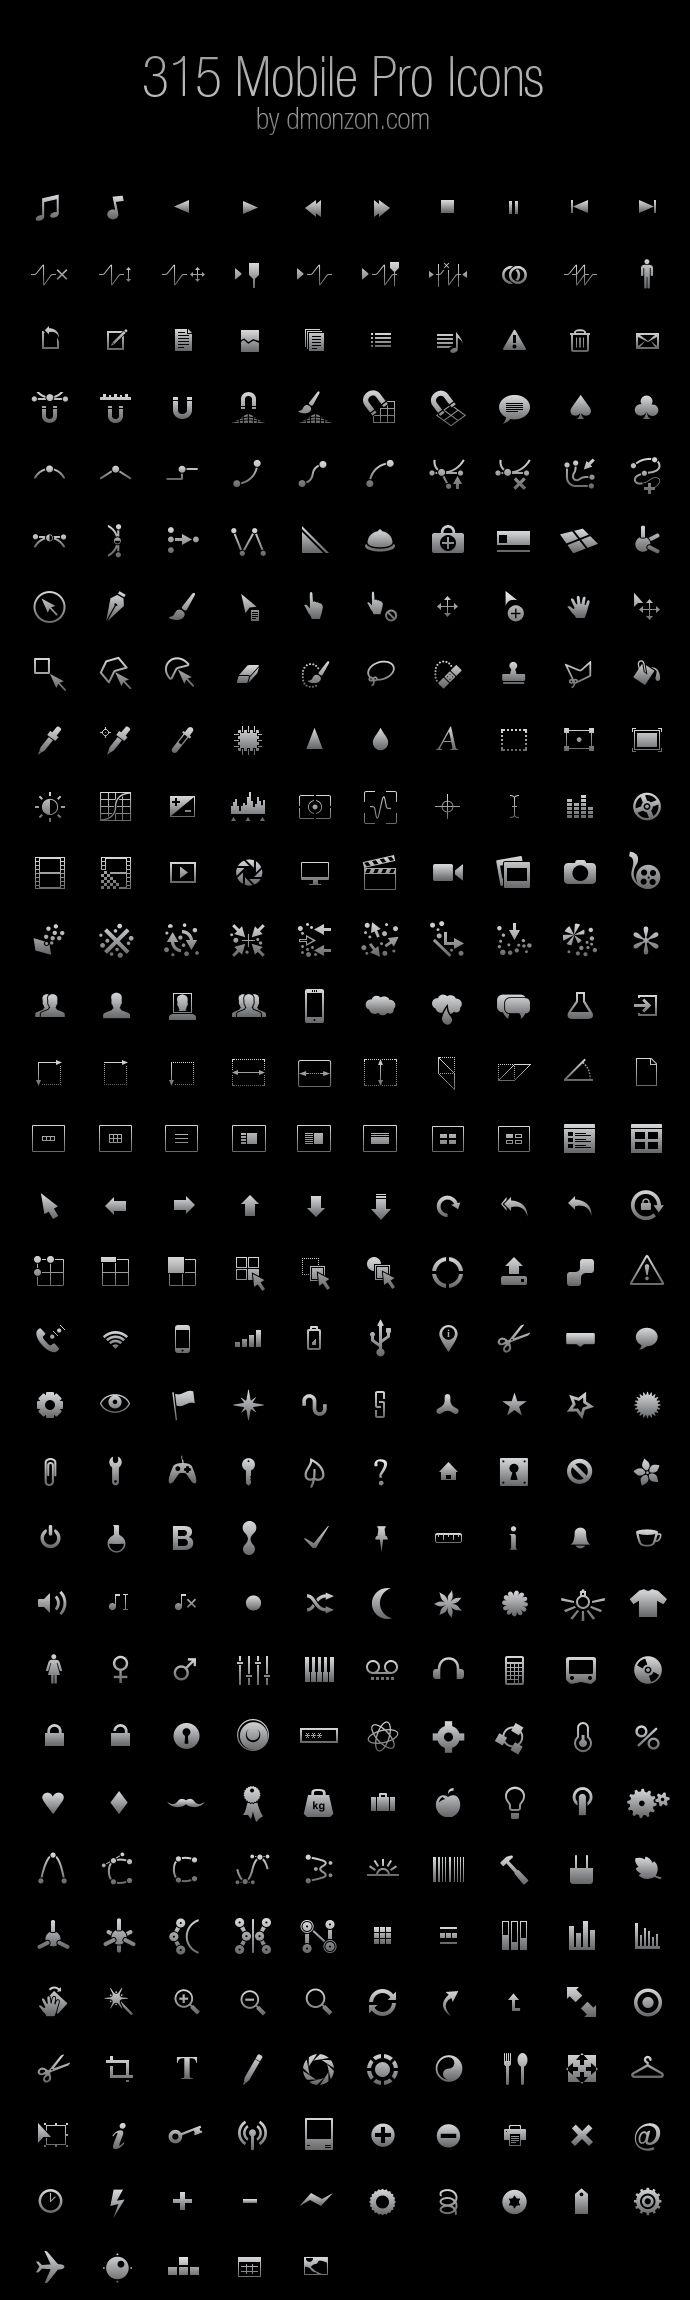 http://dmonzon.com/product/315-mobile-pro-icons/